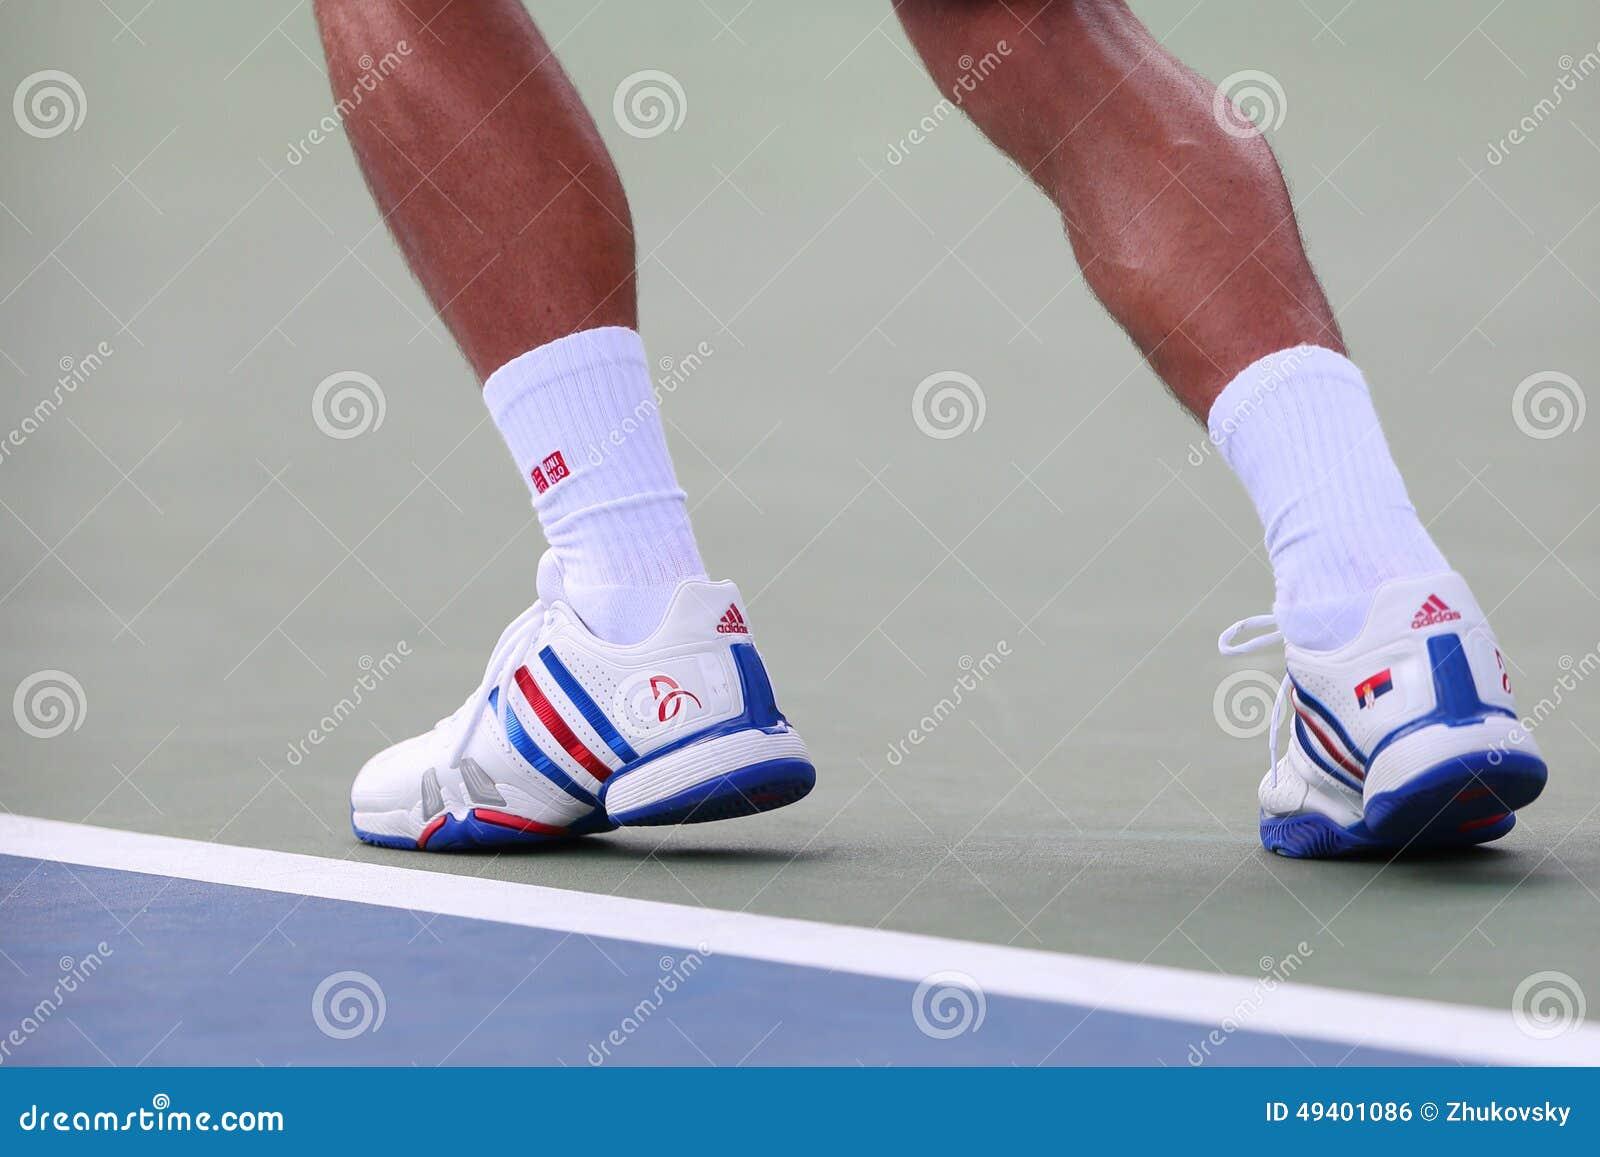 Adidas Djokovic Shoes